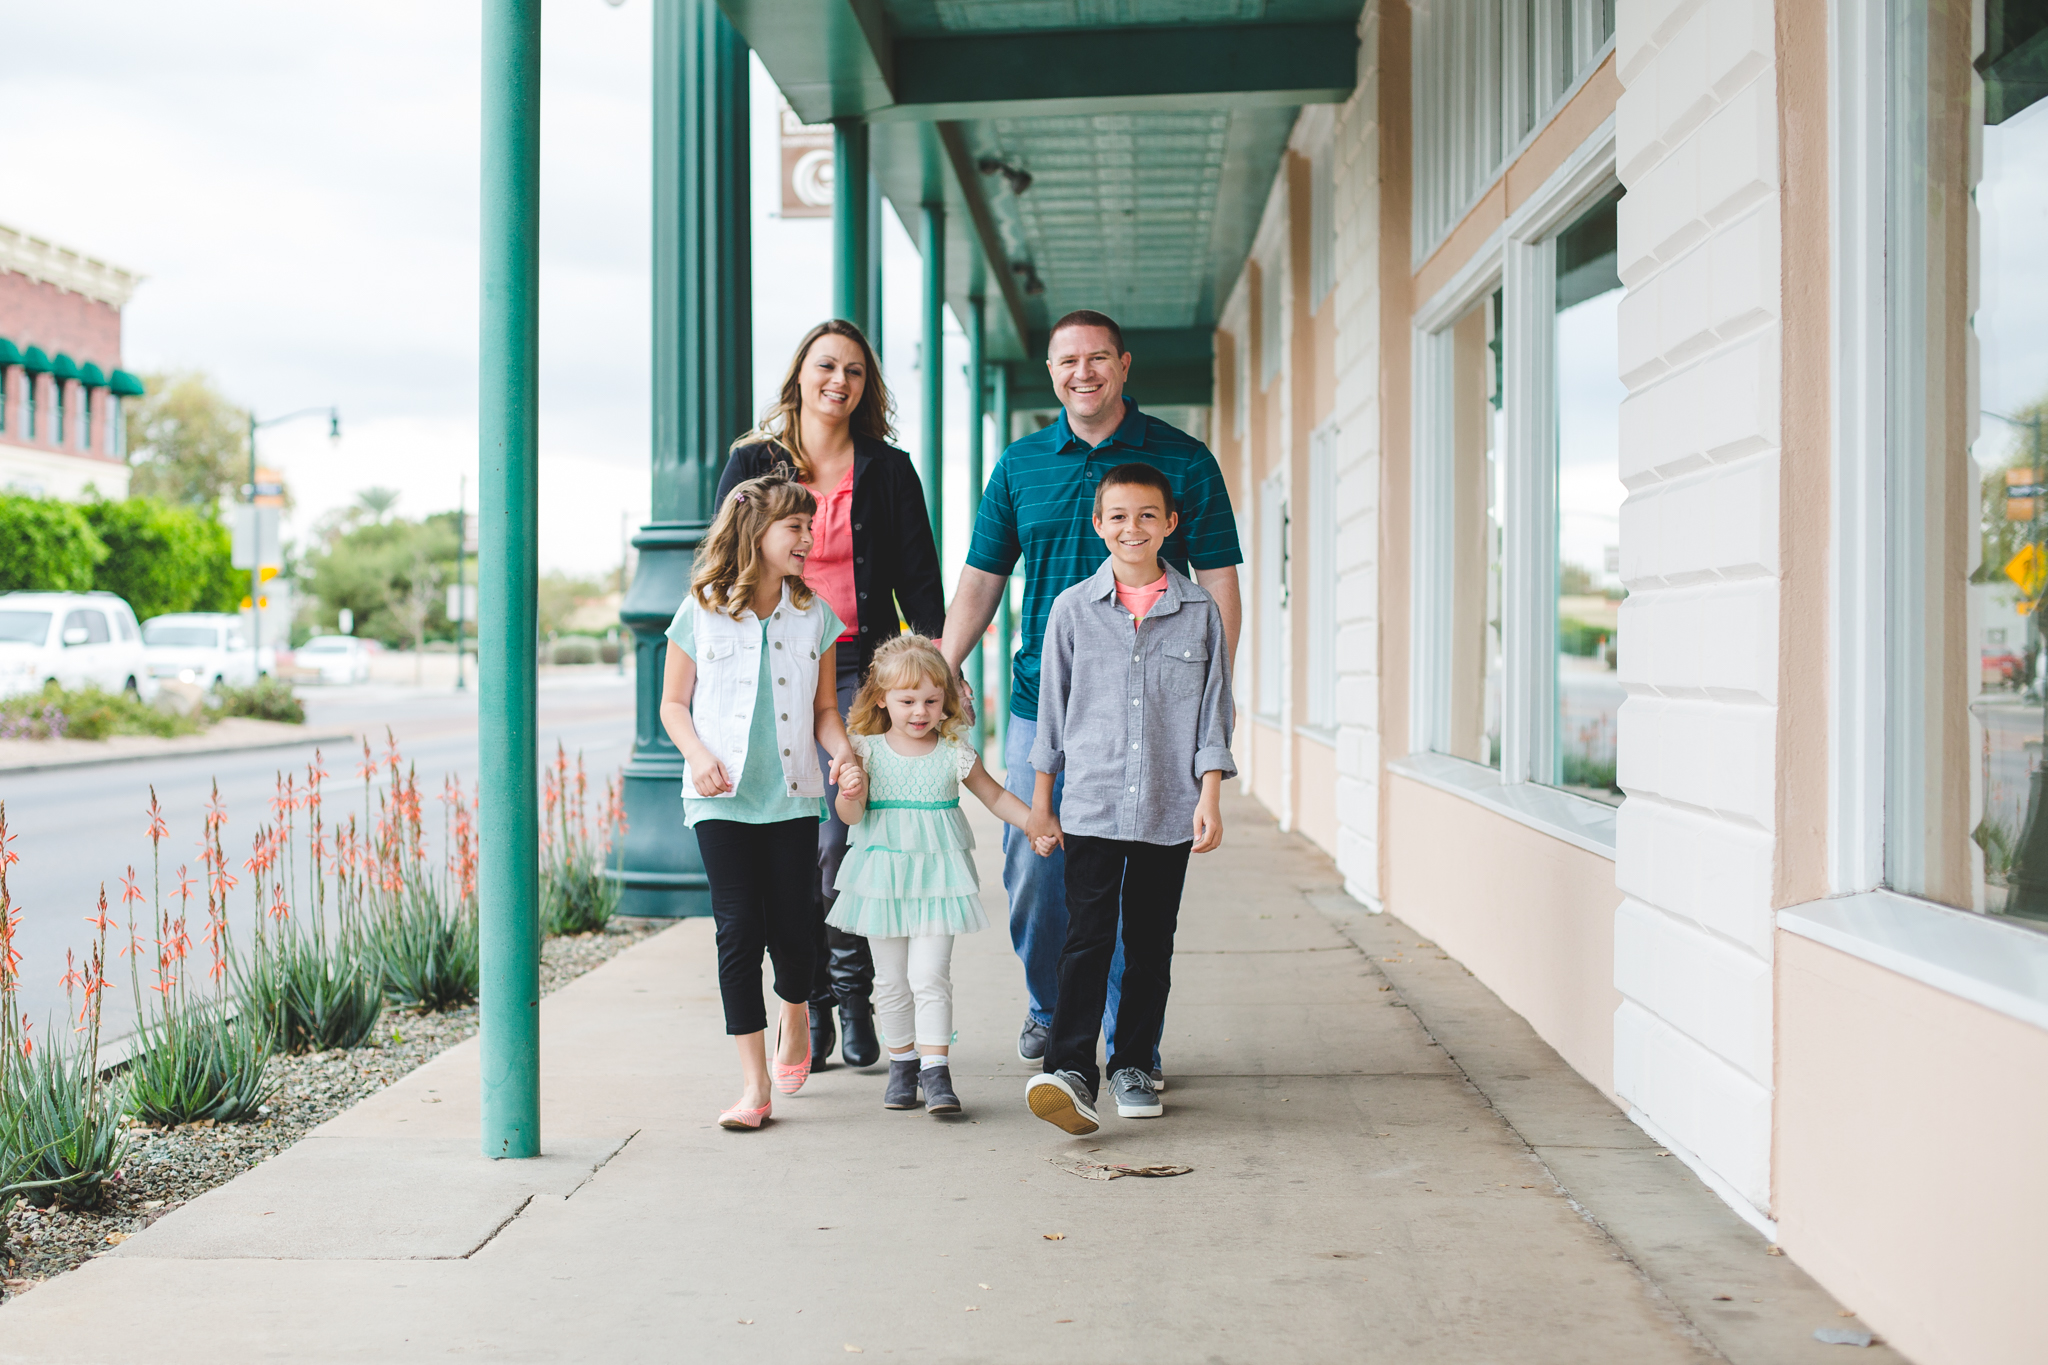 vote family walking down sidewalk